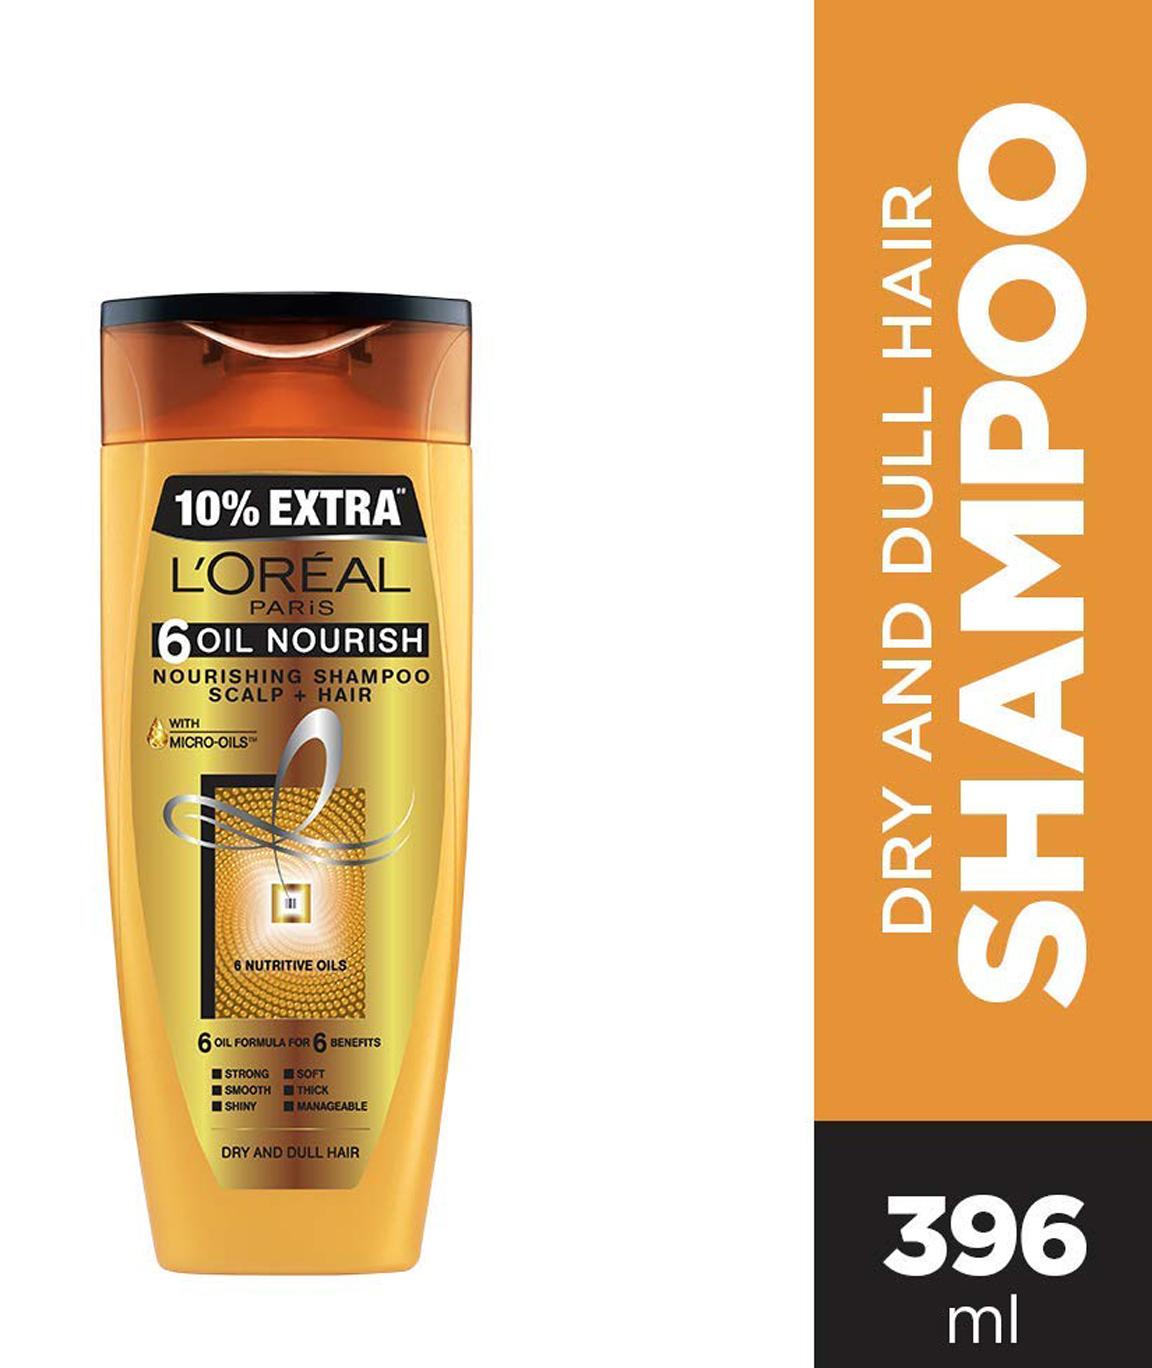 L`Oreal Paris 6 Oil Nourish Shampoo, 360ml (With 10% Extra)